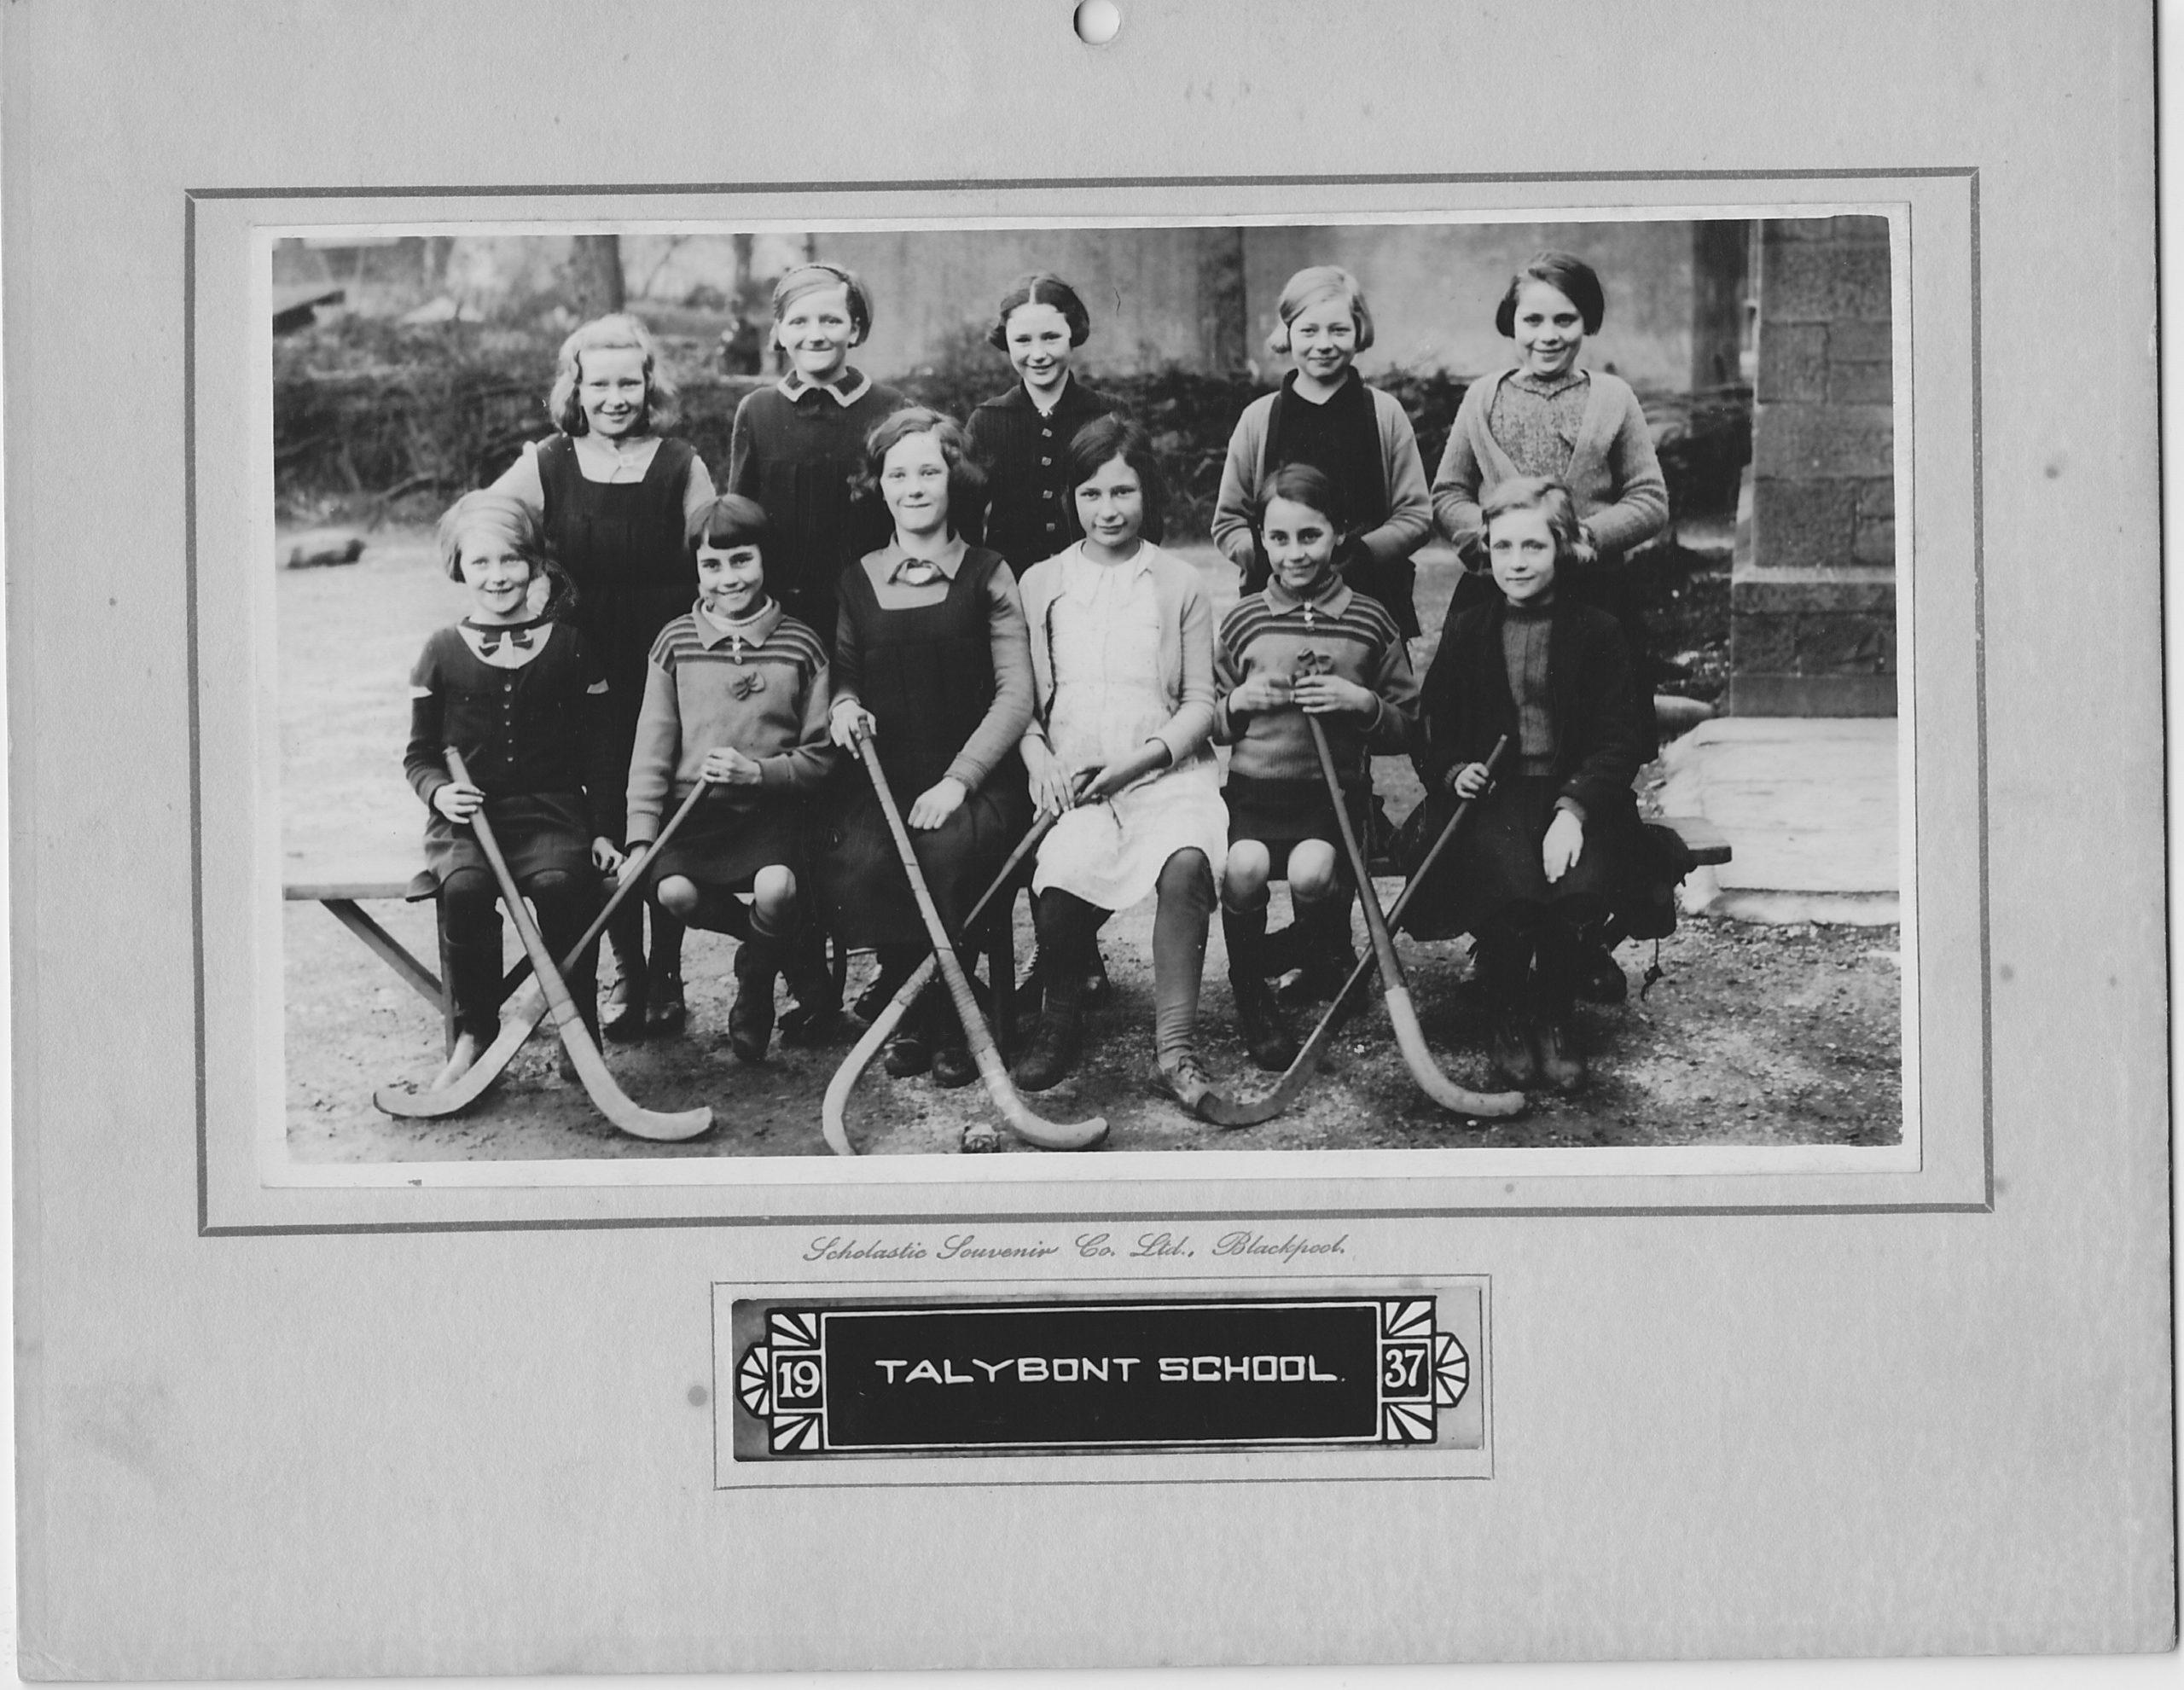 Talybont School Hockey Team 1937